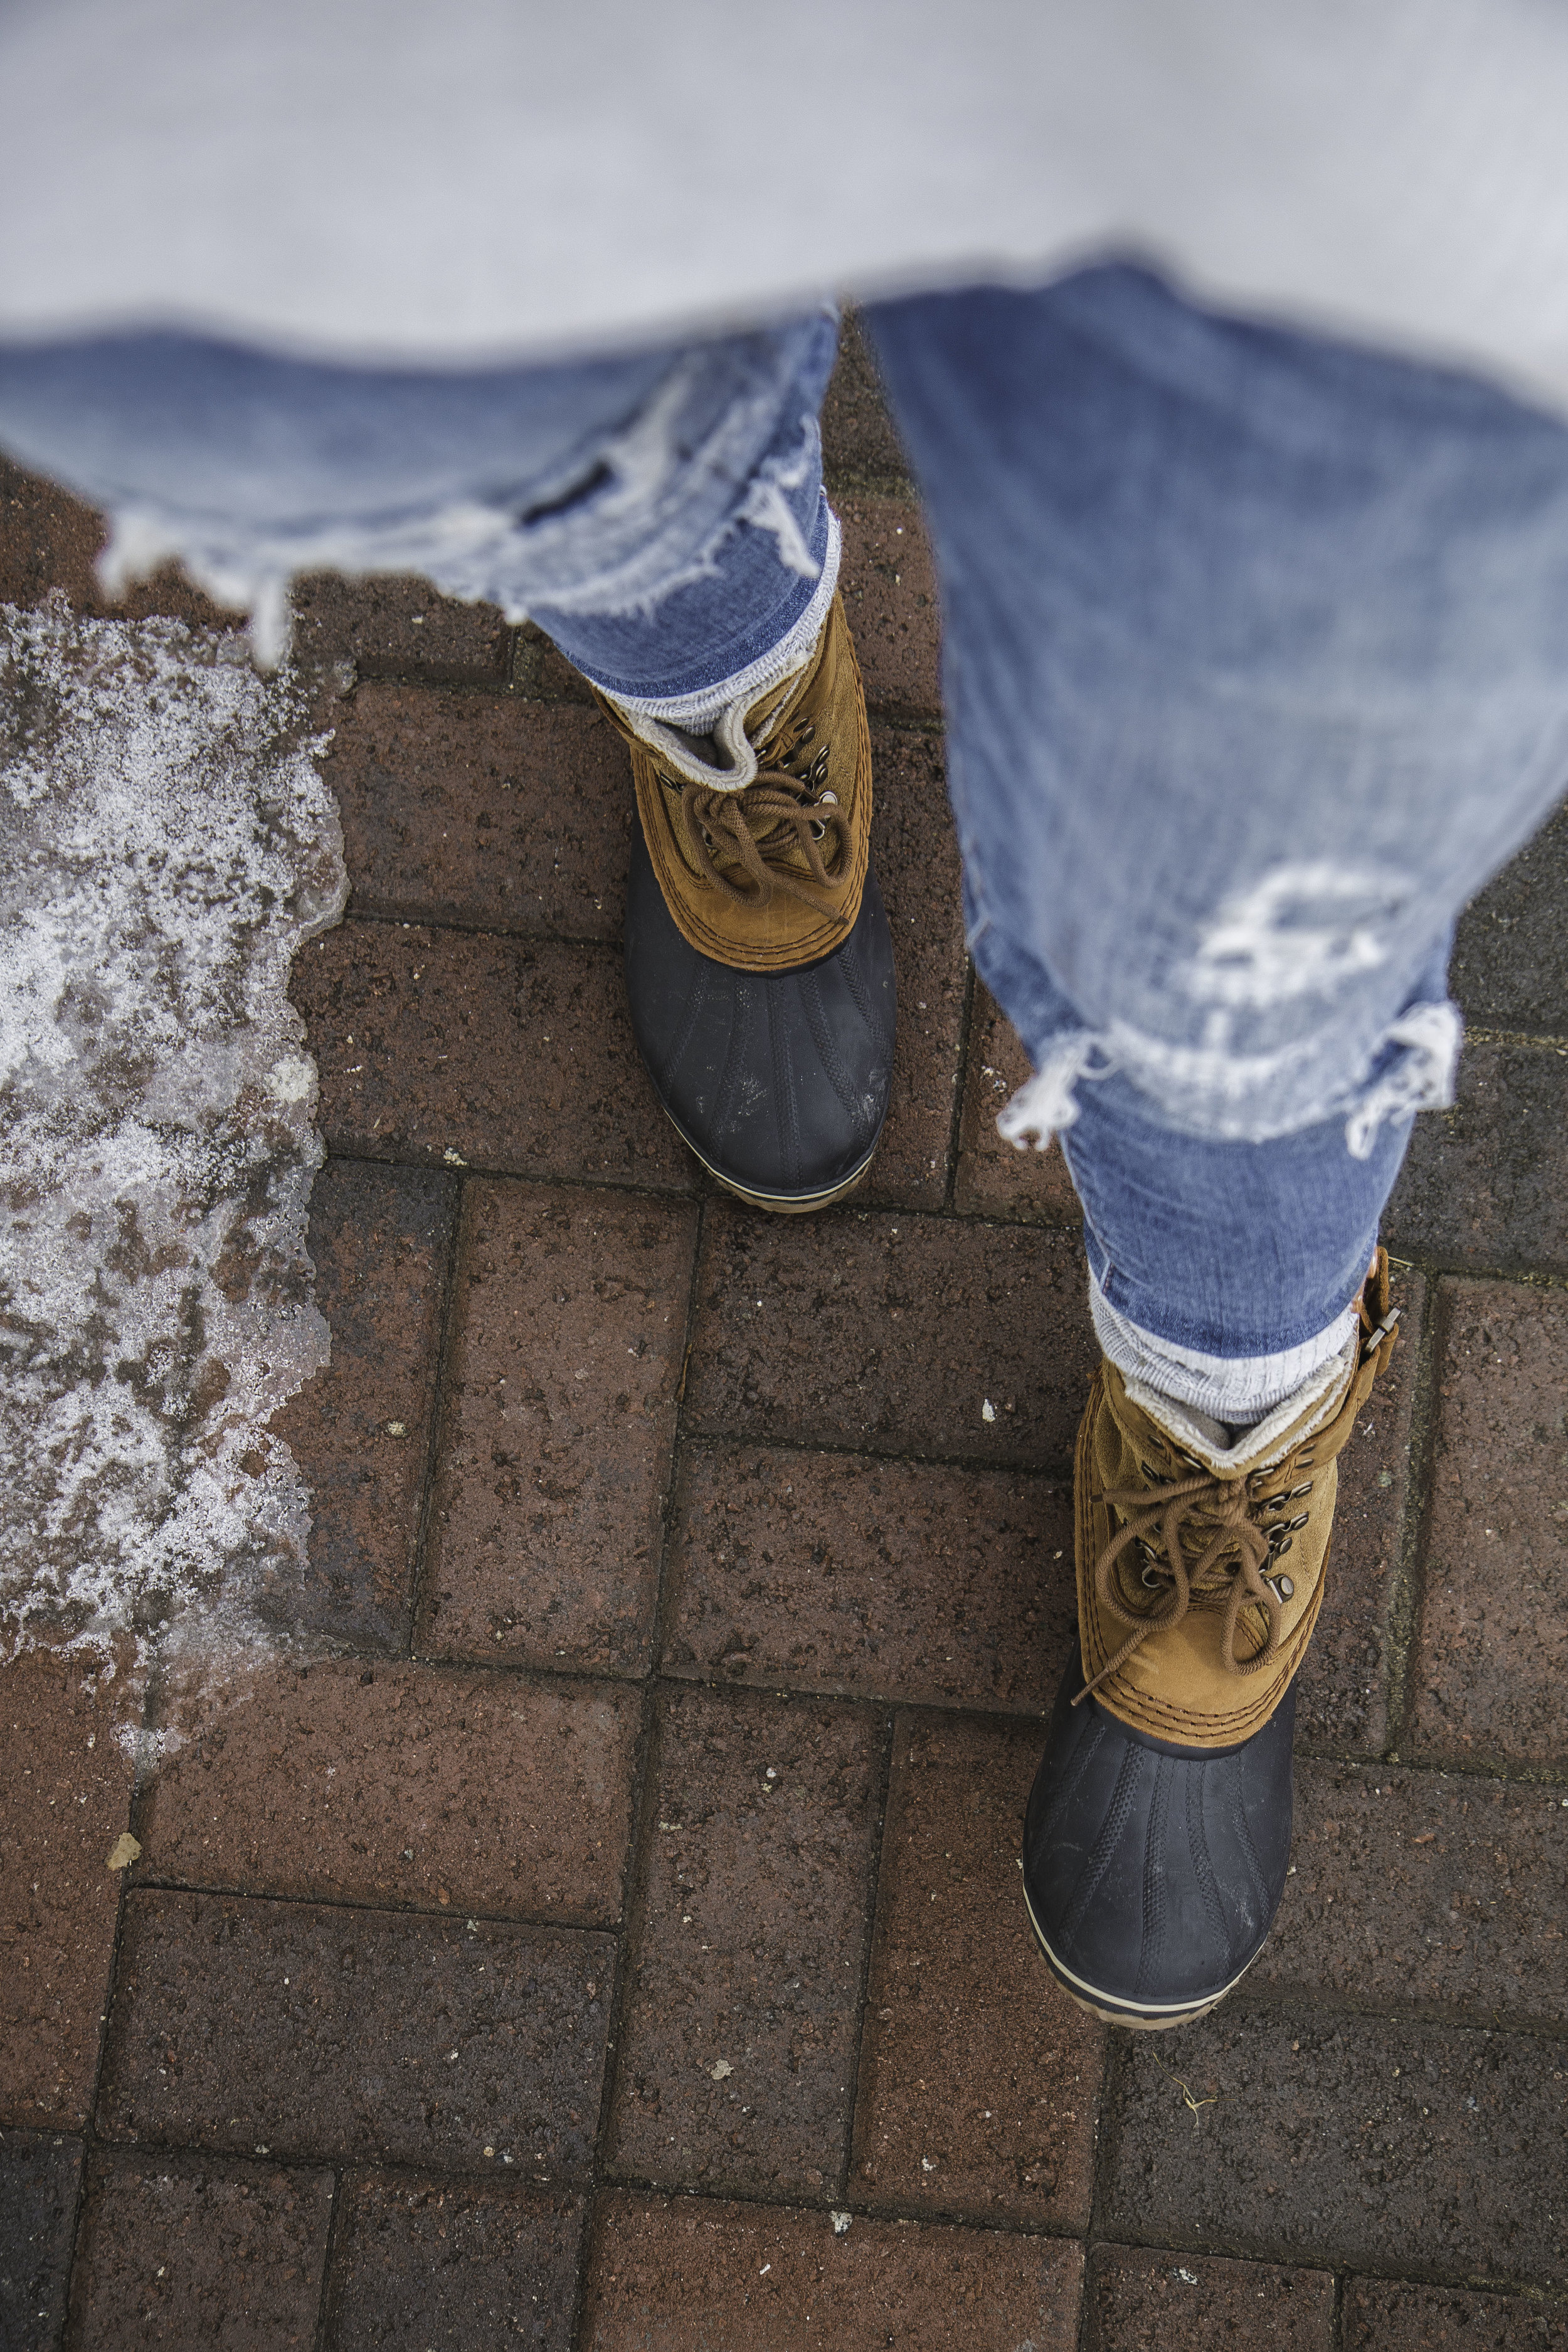 Sorel Winter Snow Boots for Women